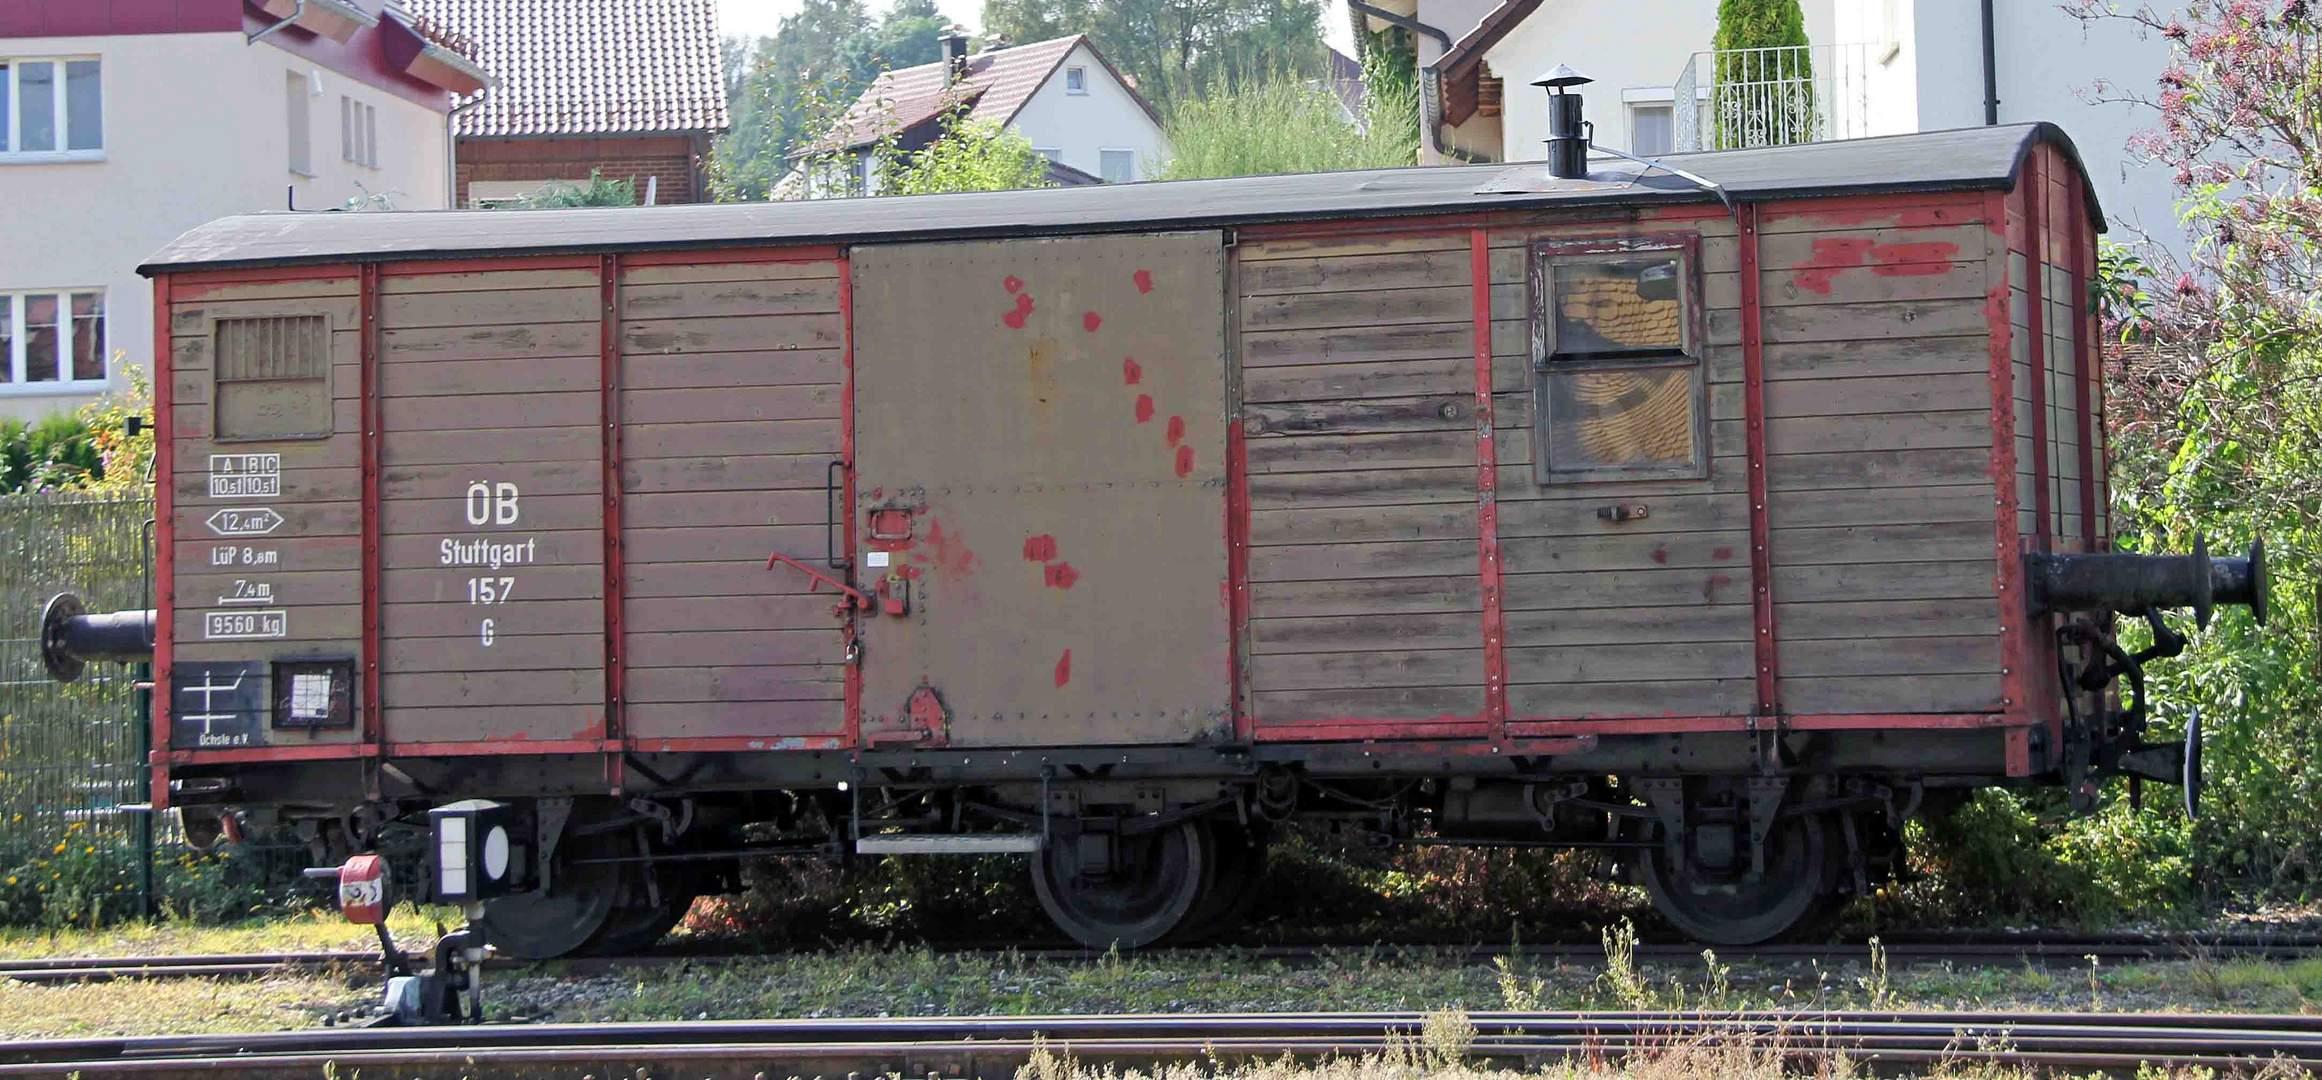 Abgestellter Wagon